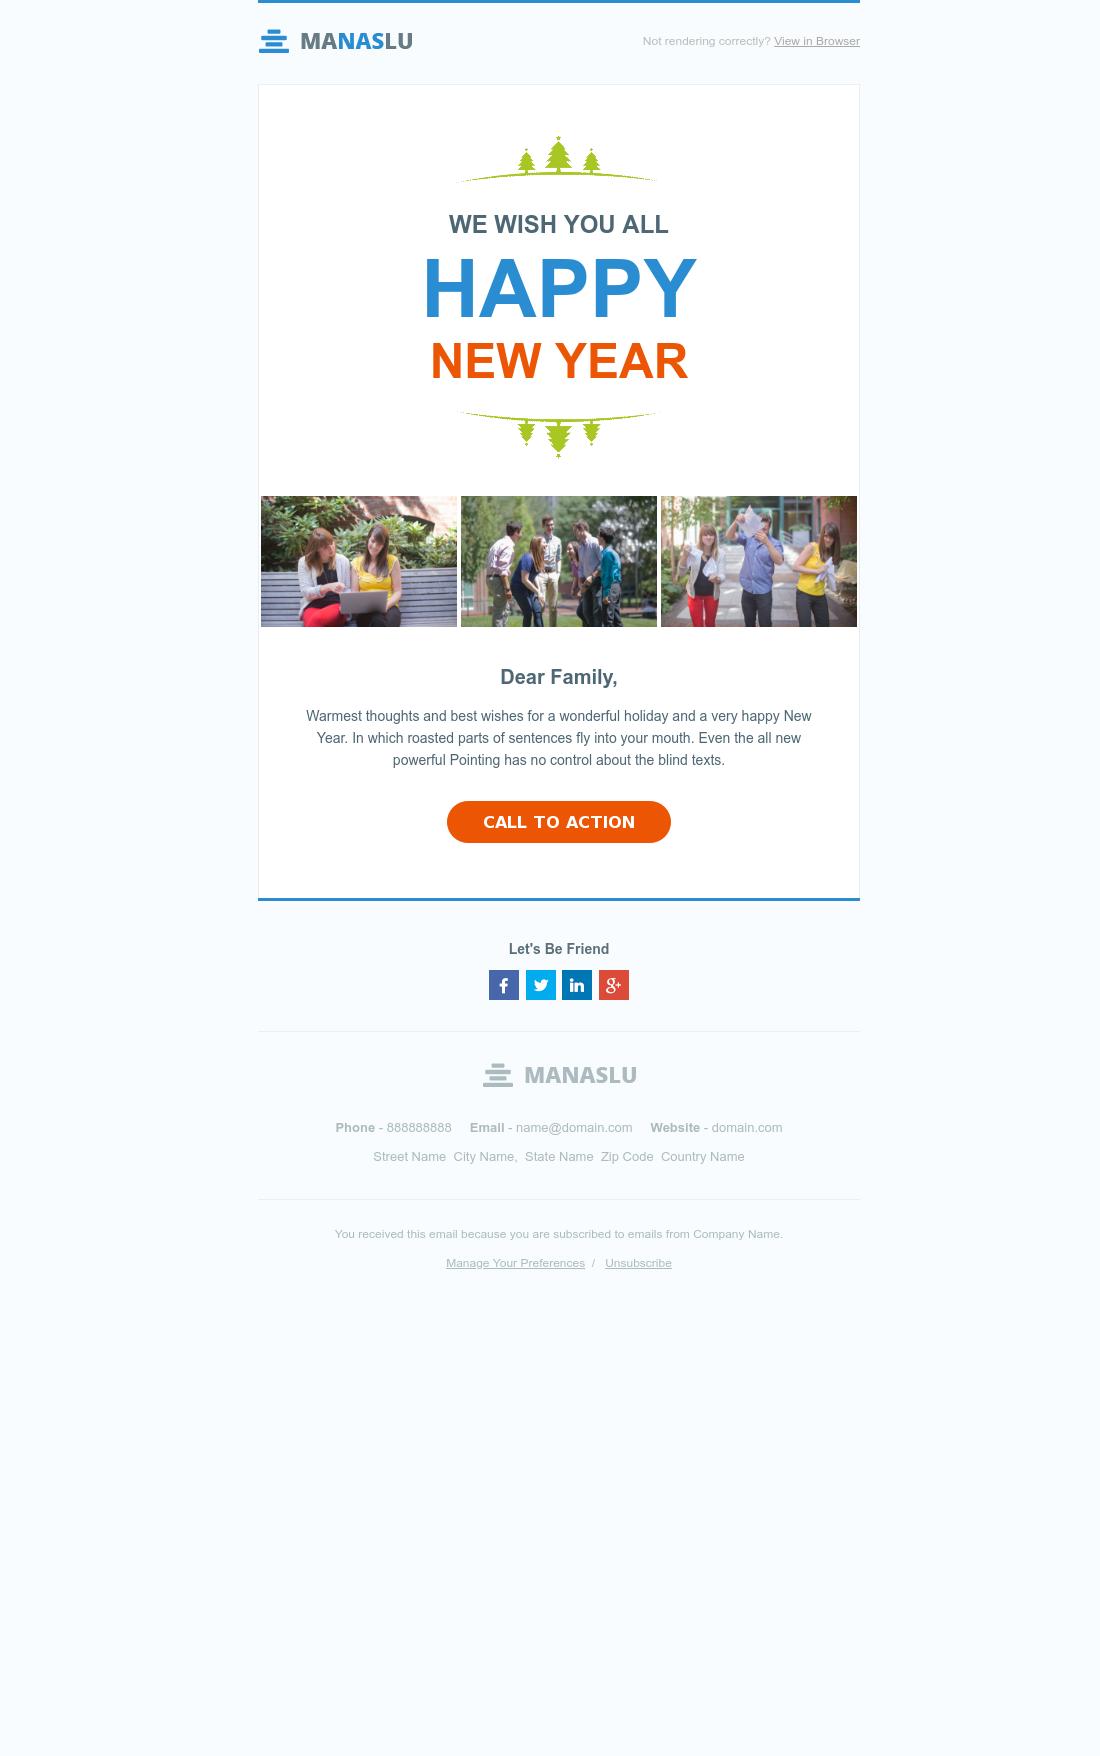 Manaslu new year greetings email template v29 hubspot externallink m4hsunfo